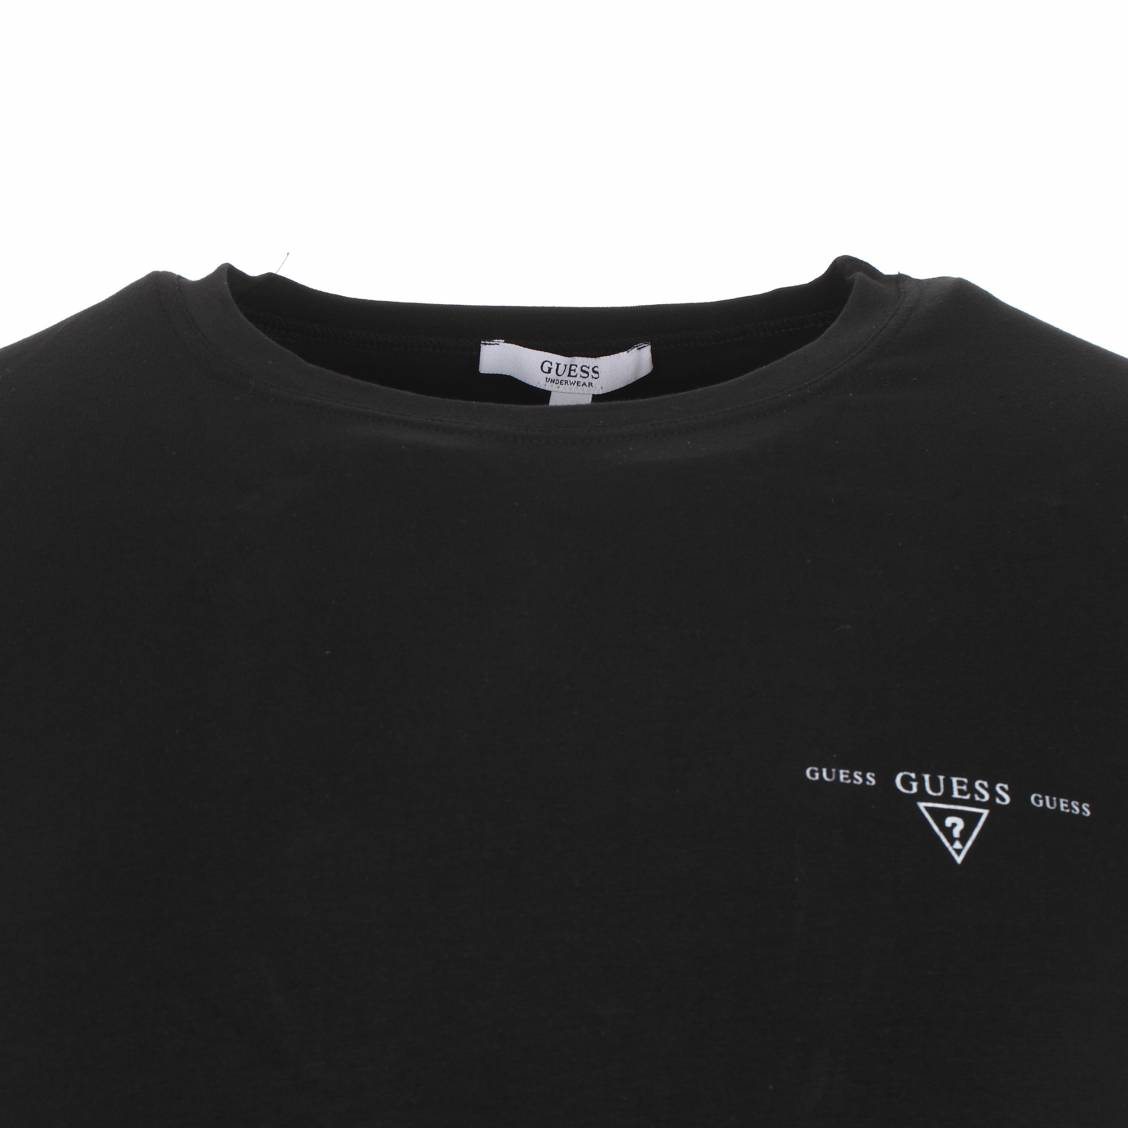 Tee-shirt Guess en coton noir avec logo blanc discret